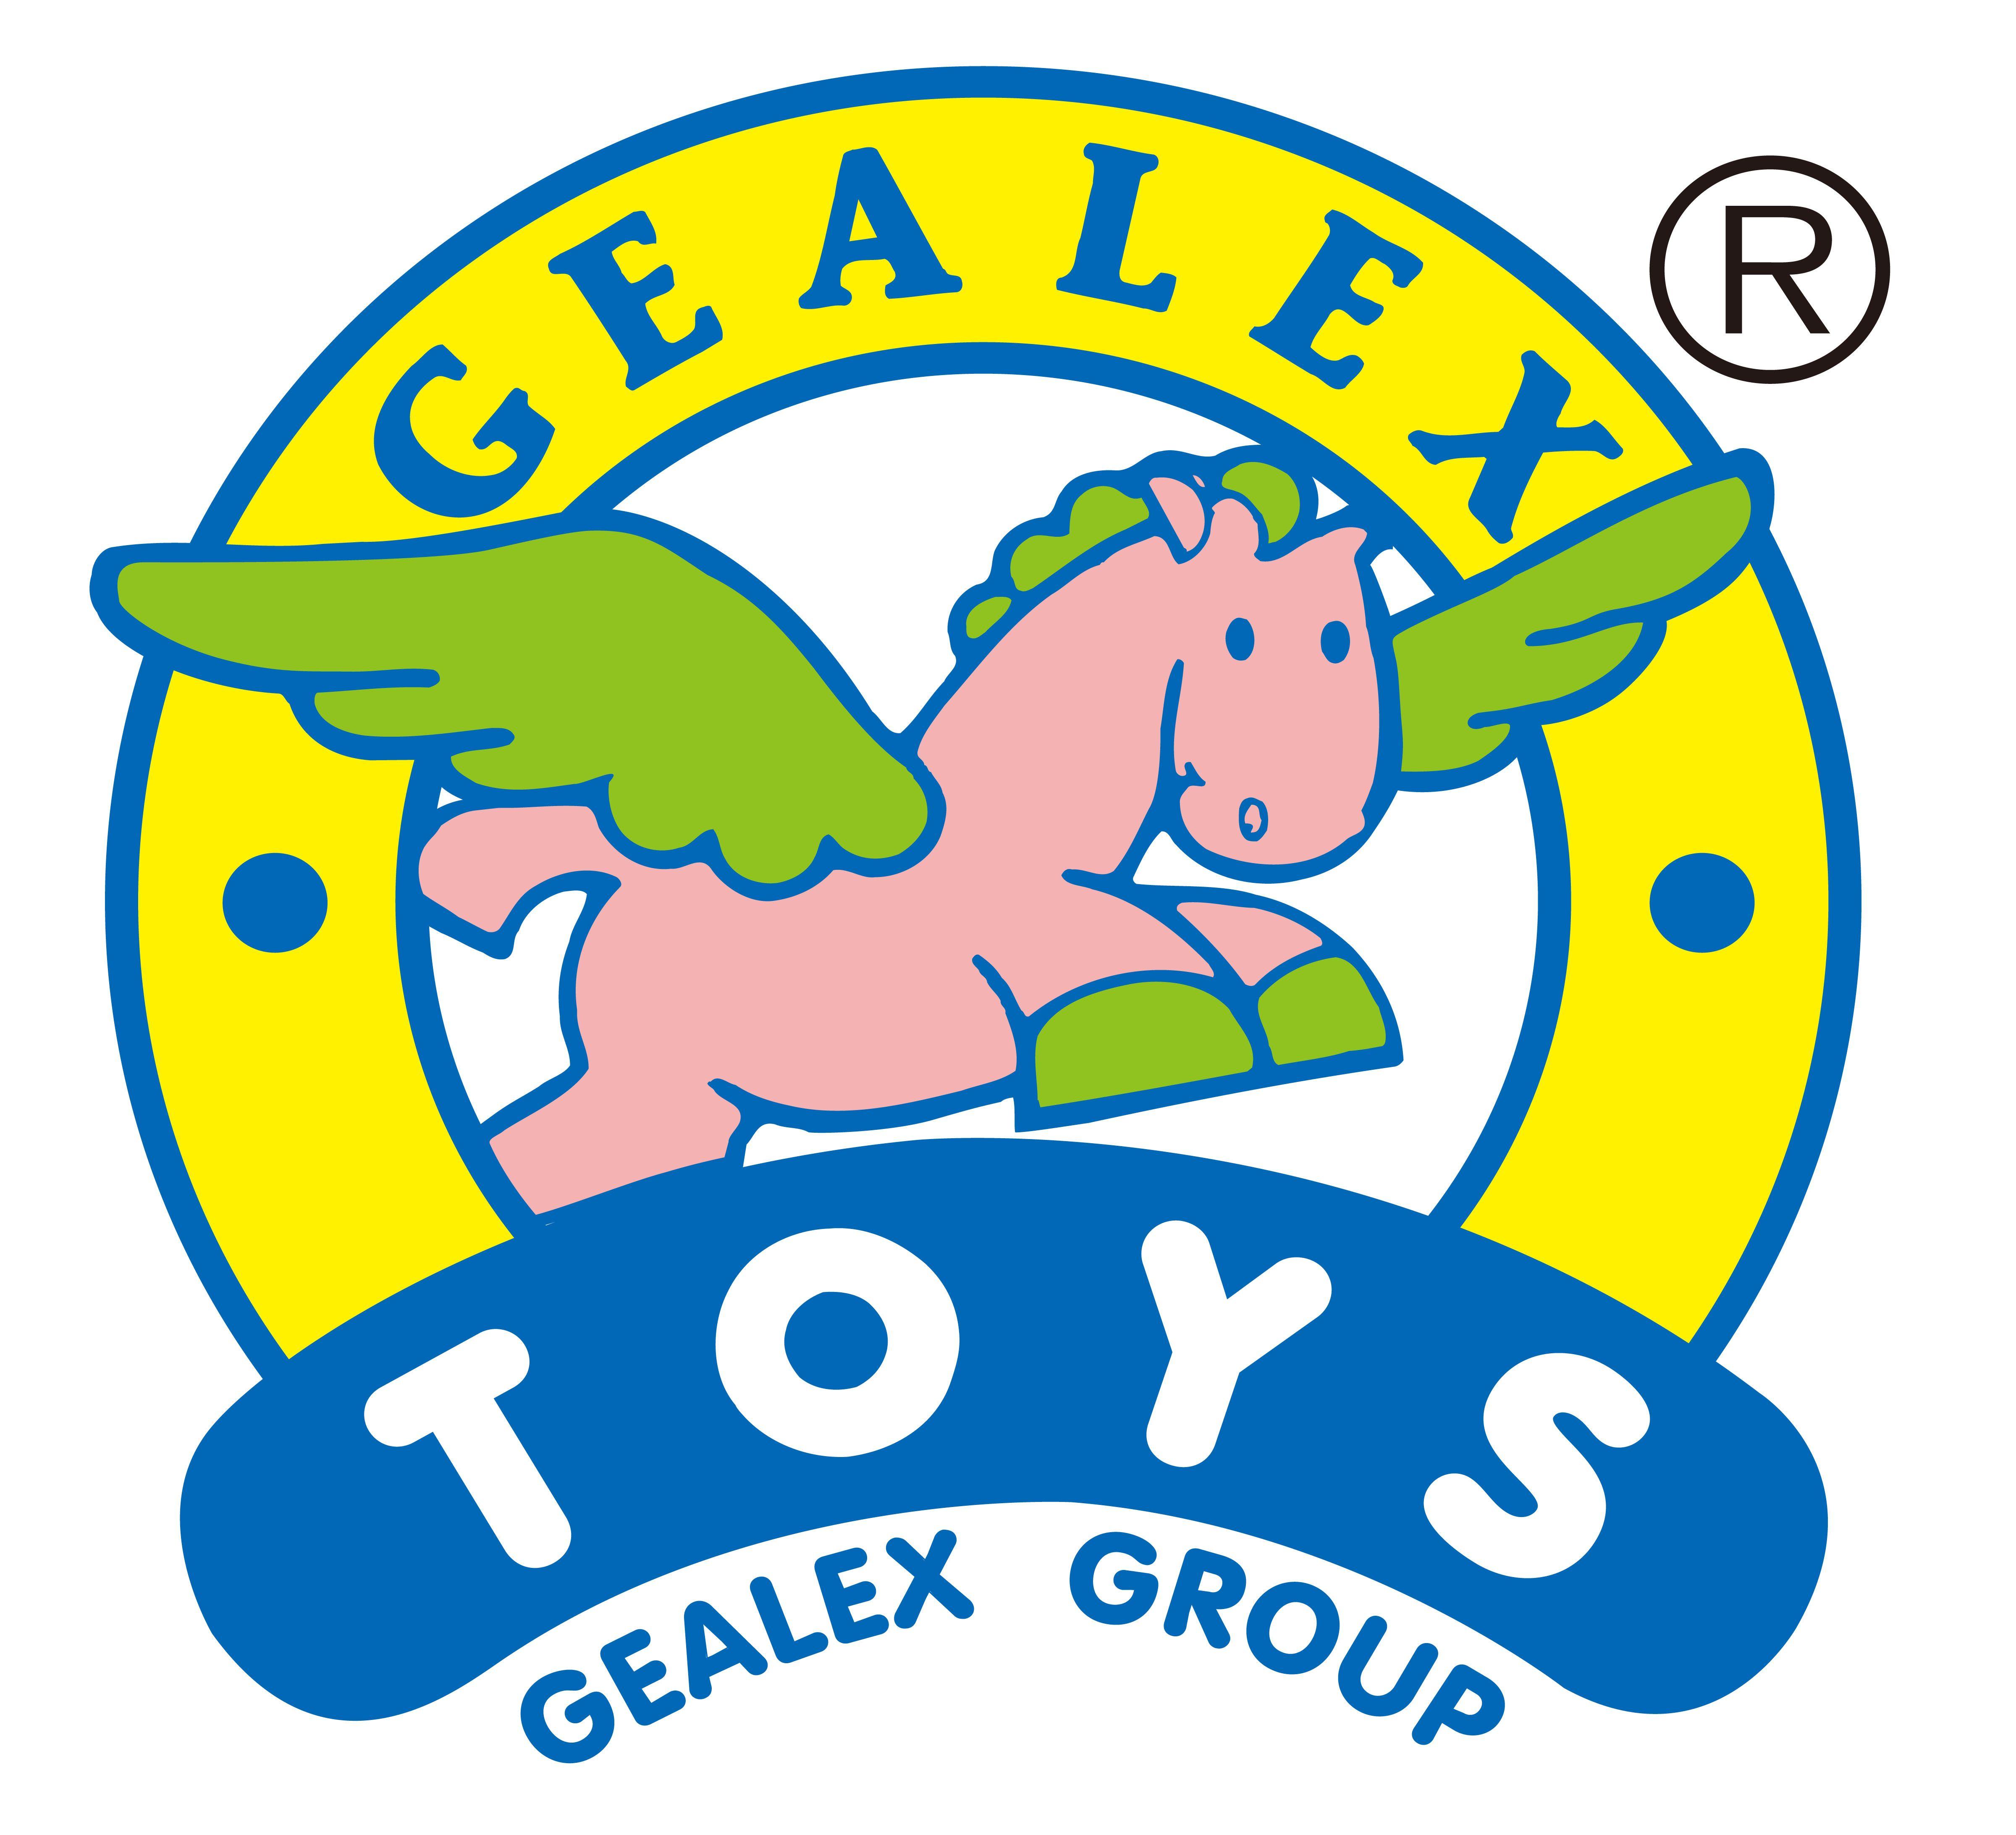 Gealex Toys Mfg. Co. Ltd.